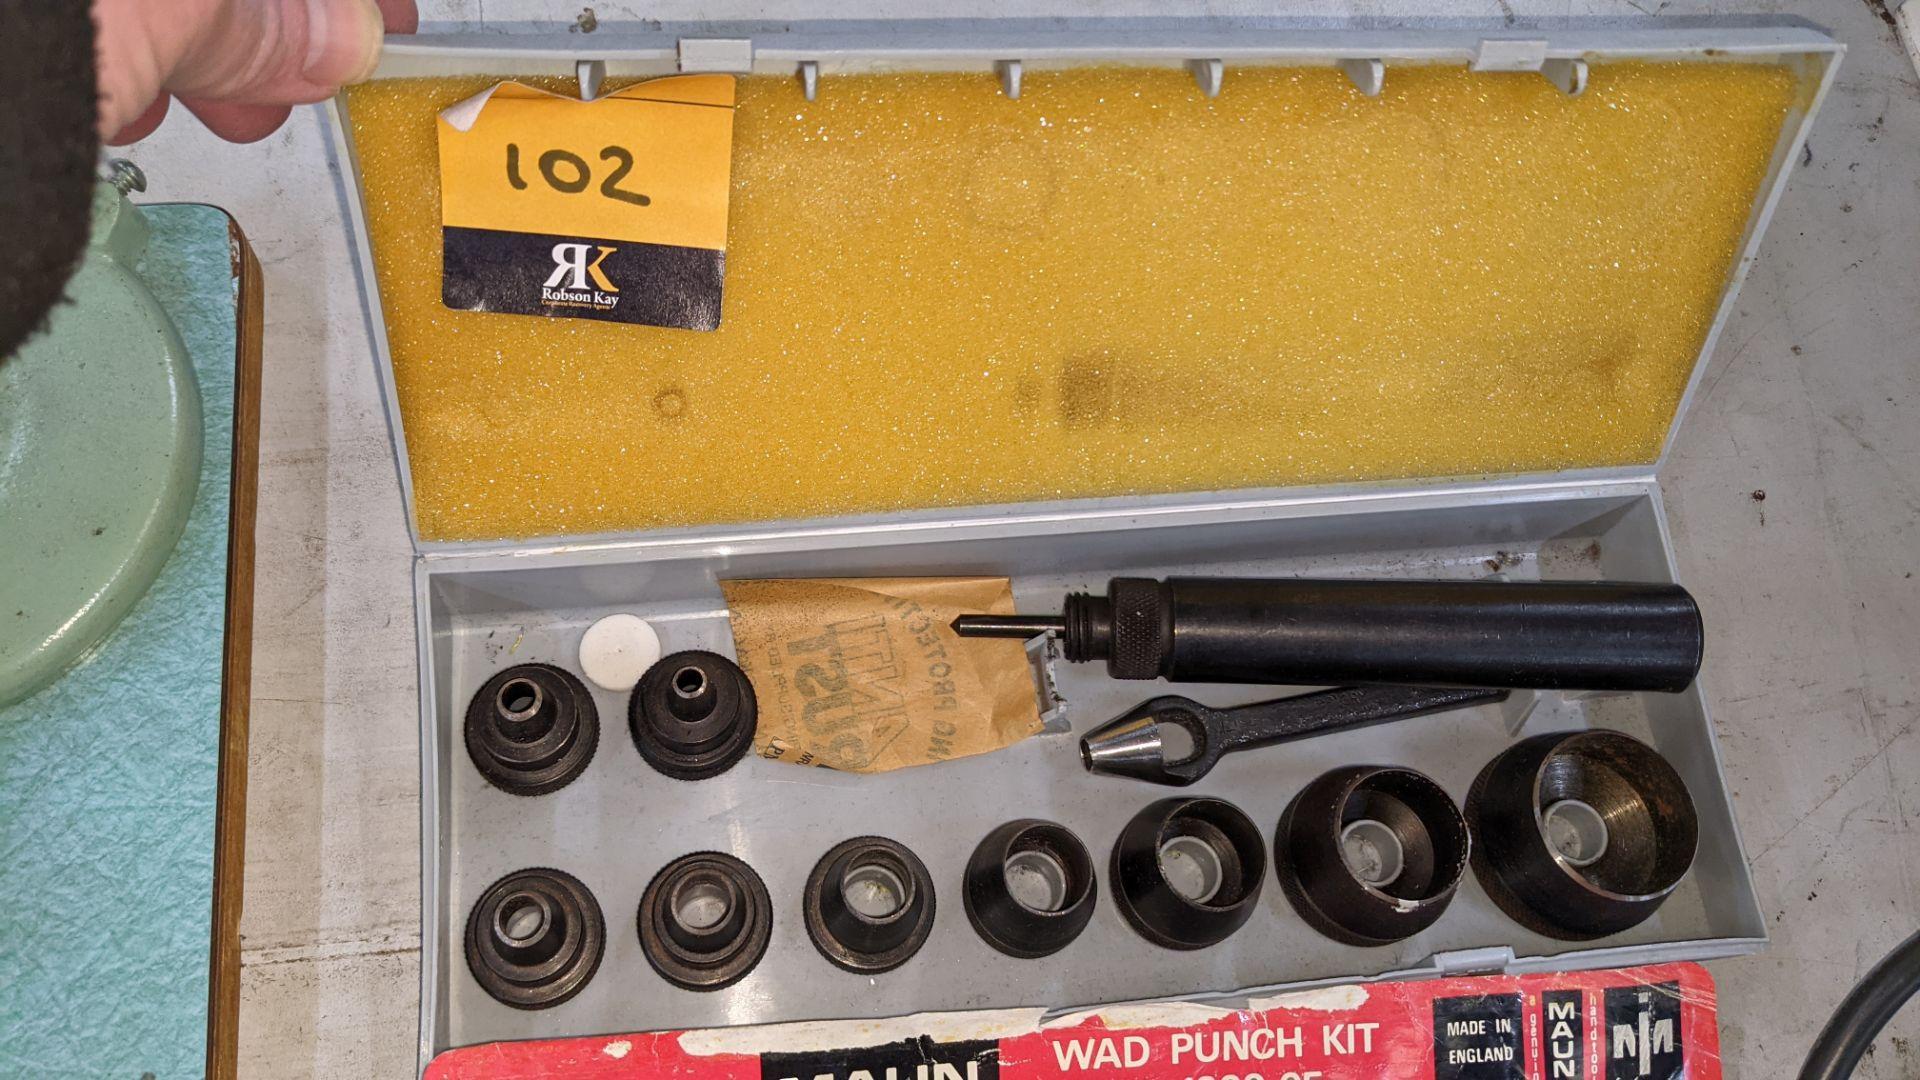 Maun wad punch kit number 1000-05 - Image 4 of 4